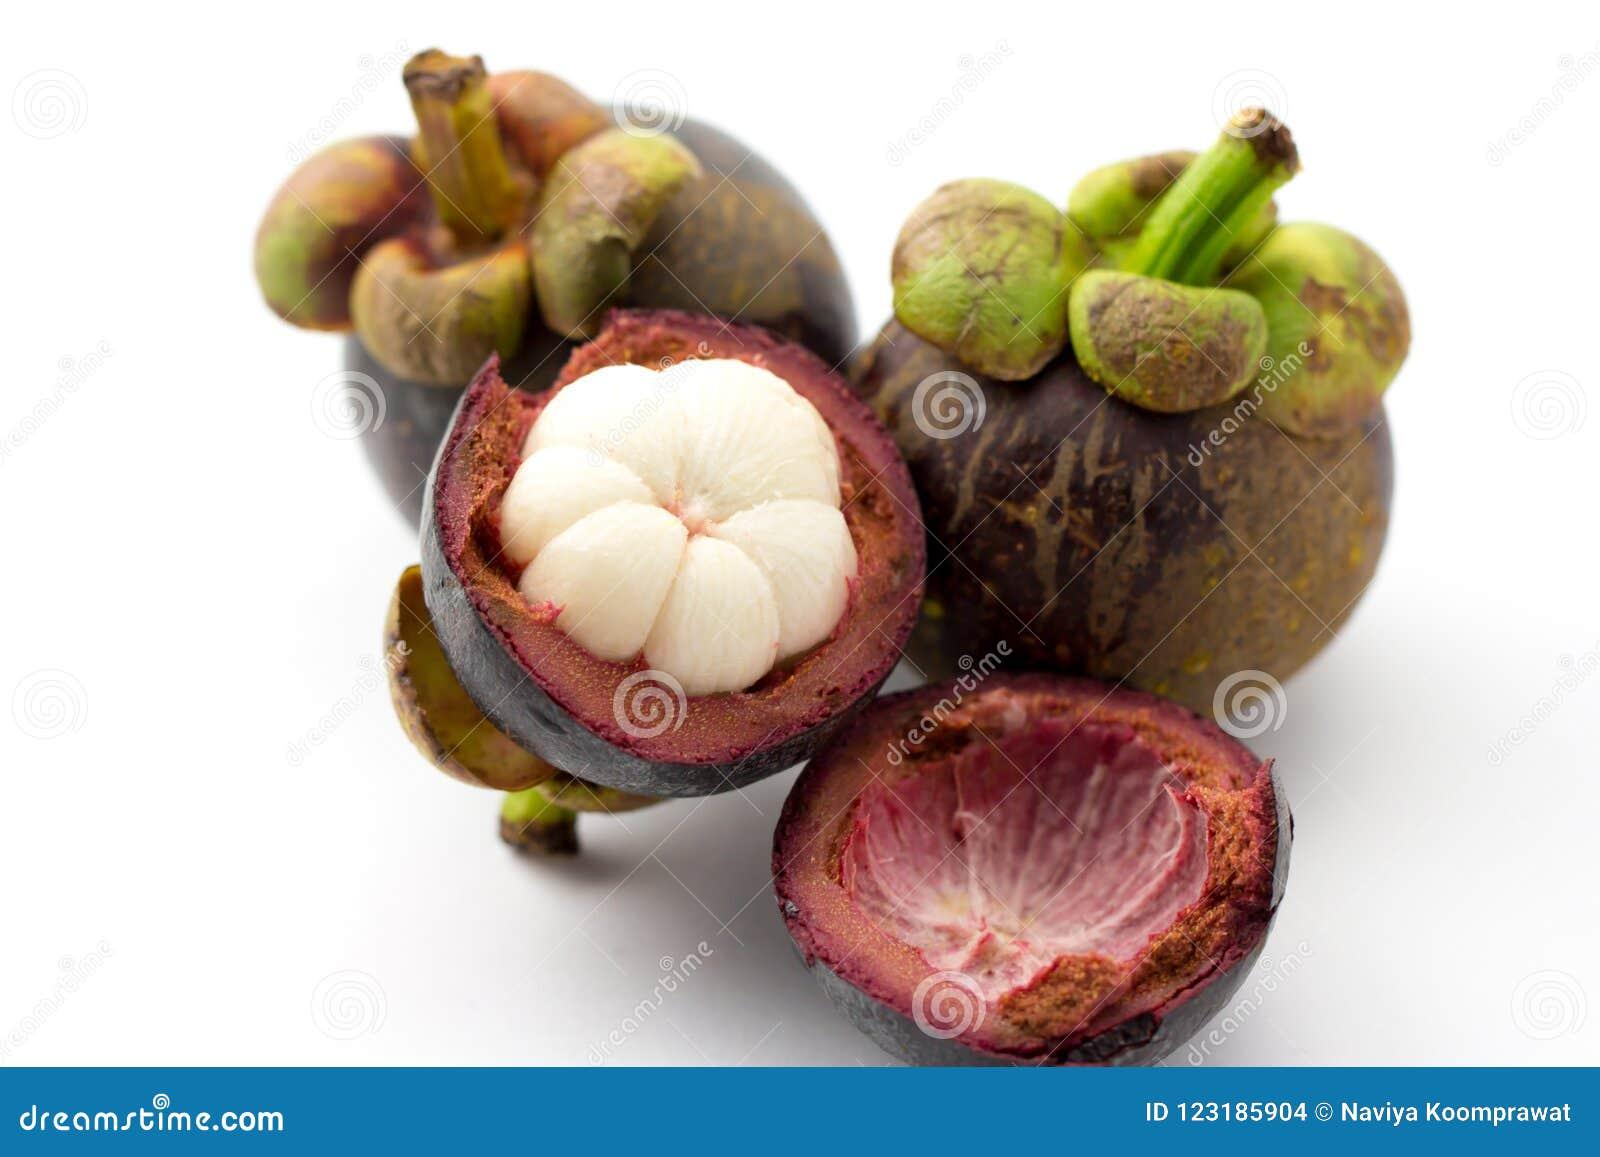 Mangostan królowa owoc Tajlandia